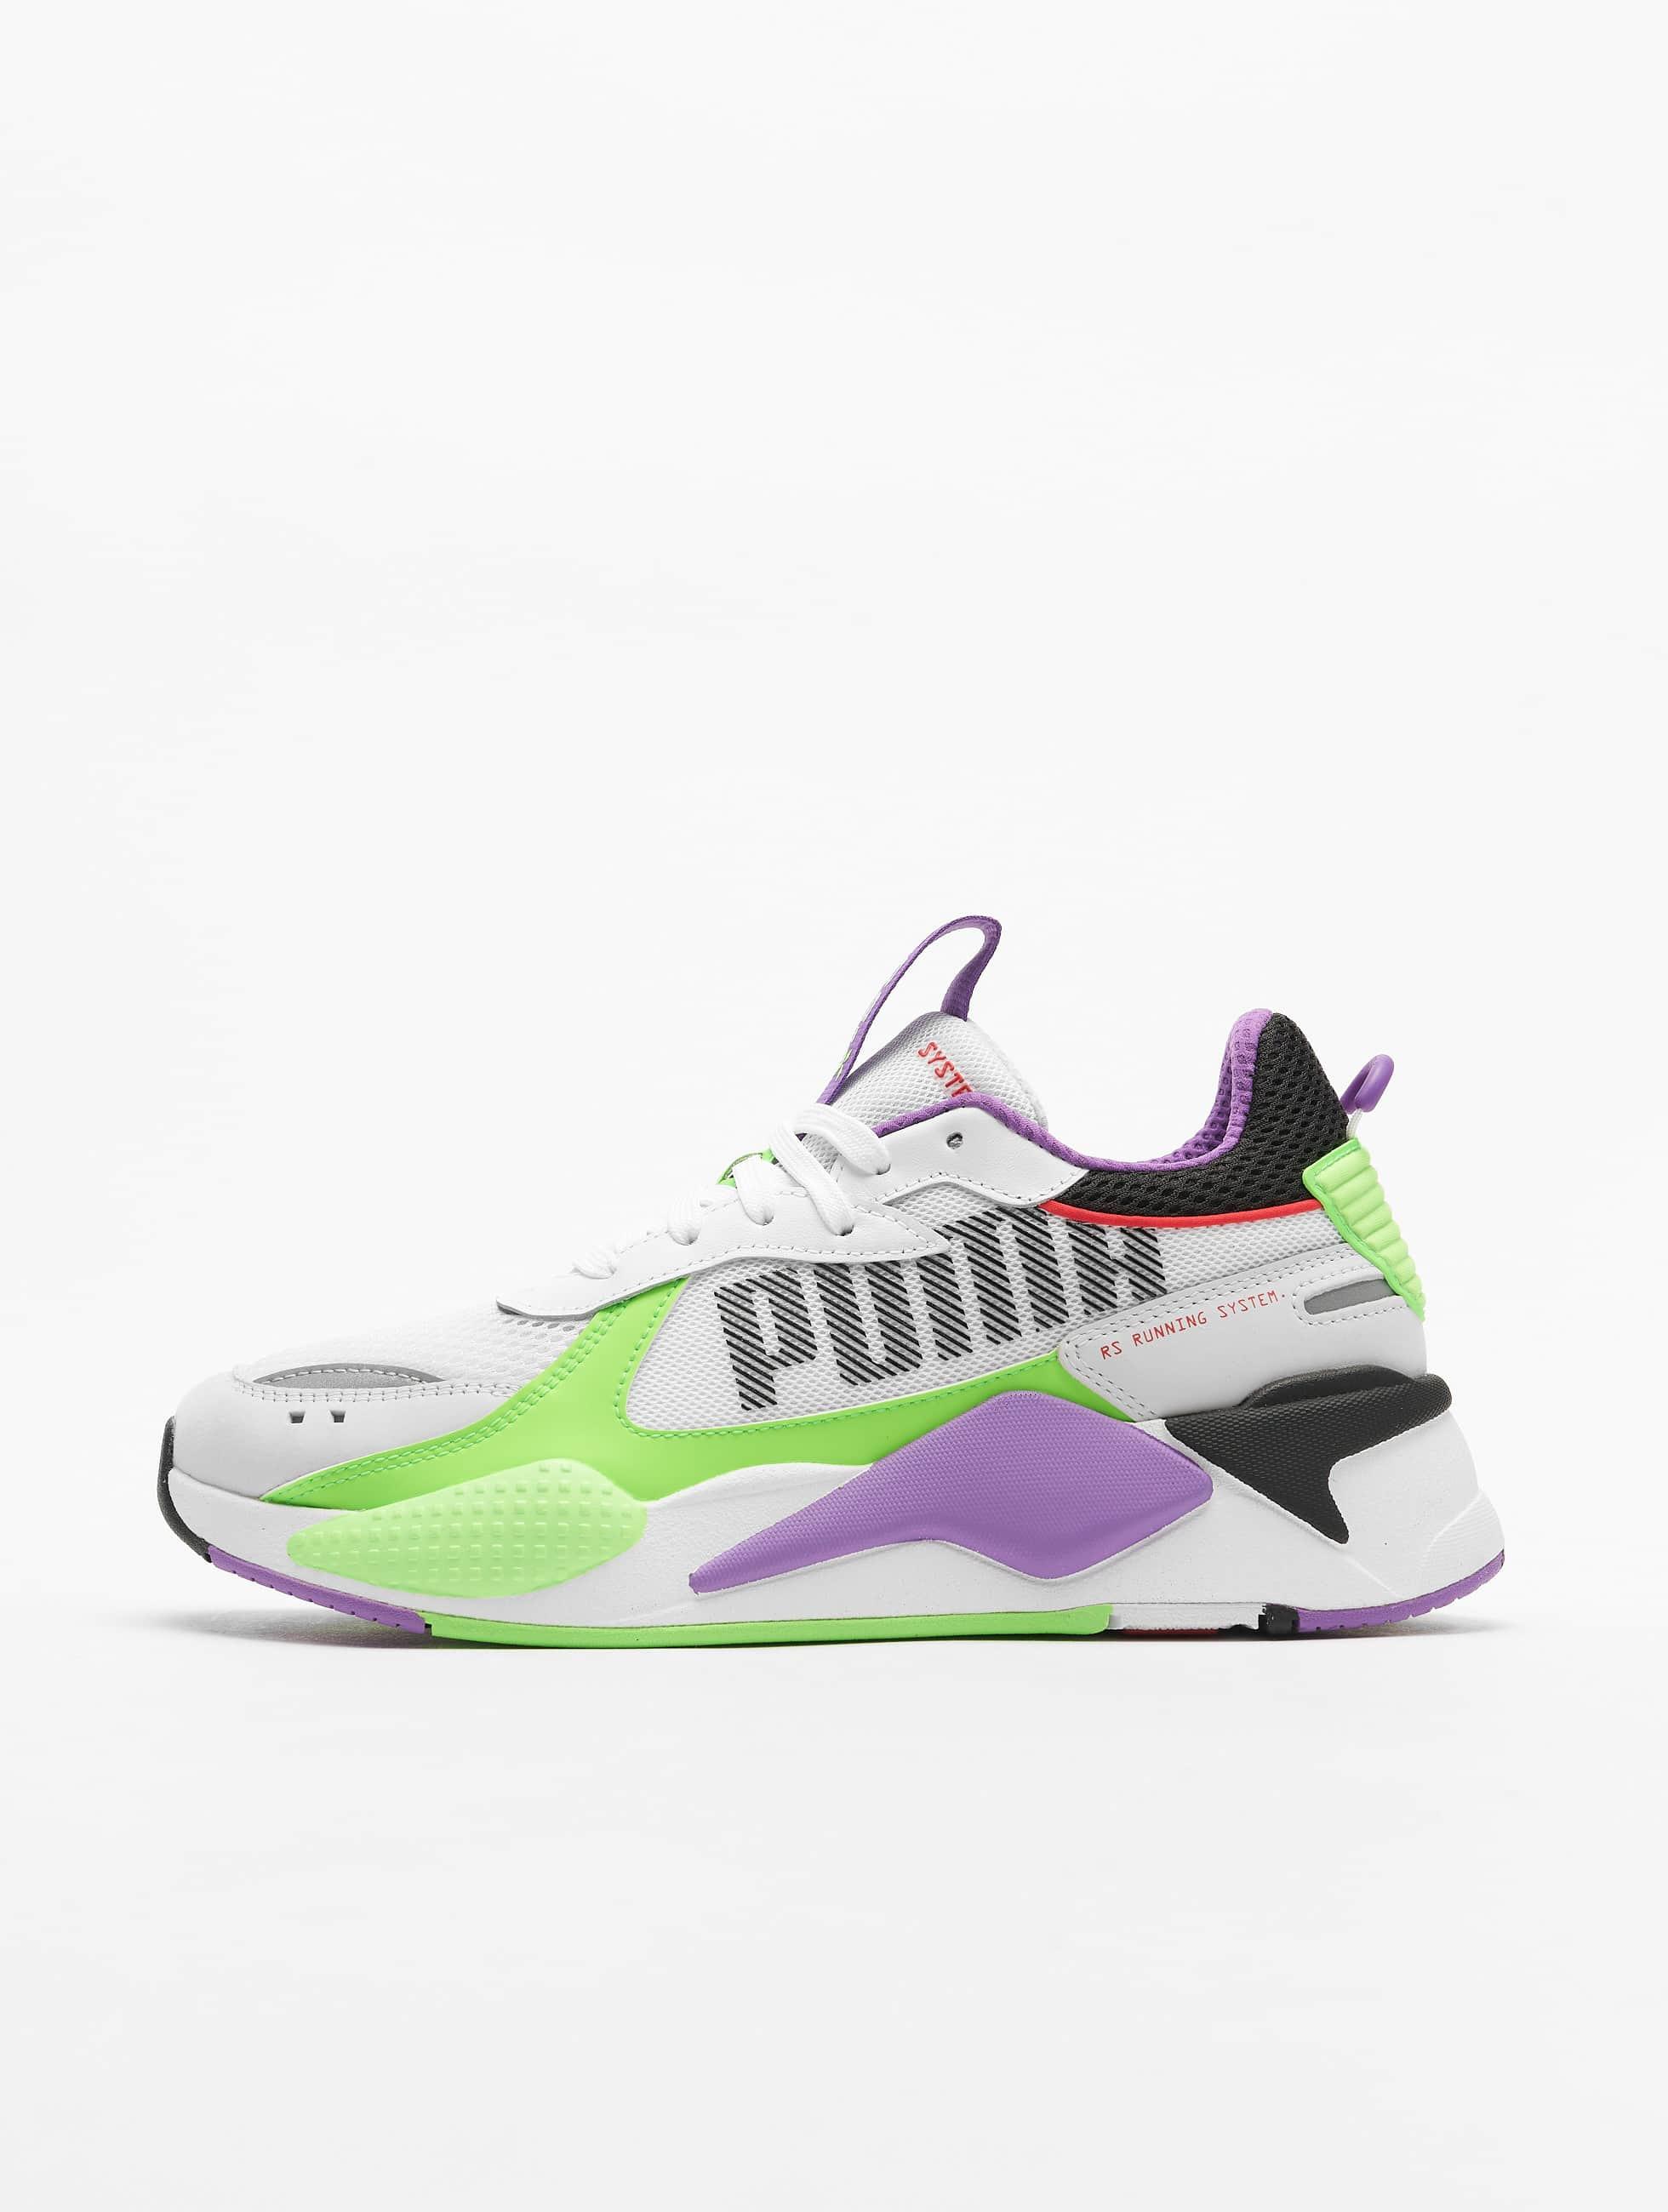 Puma RS X Bold Sneakers Puma WhiteGreen GeckoRoyal Lilac